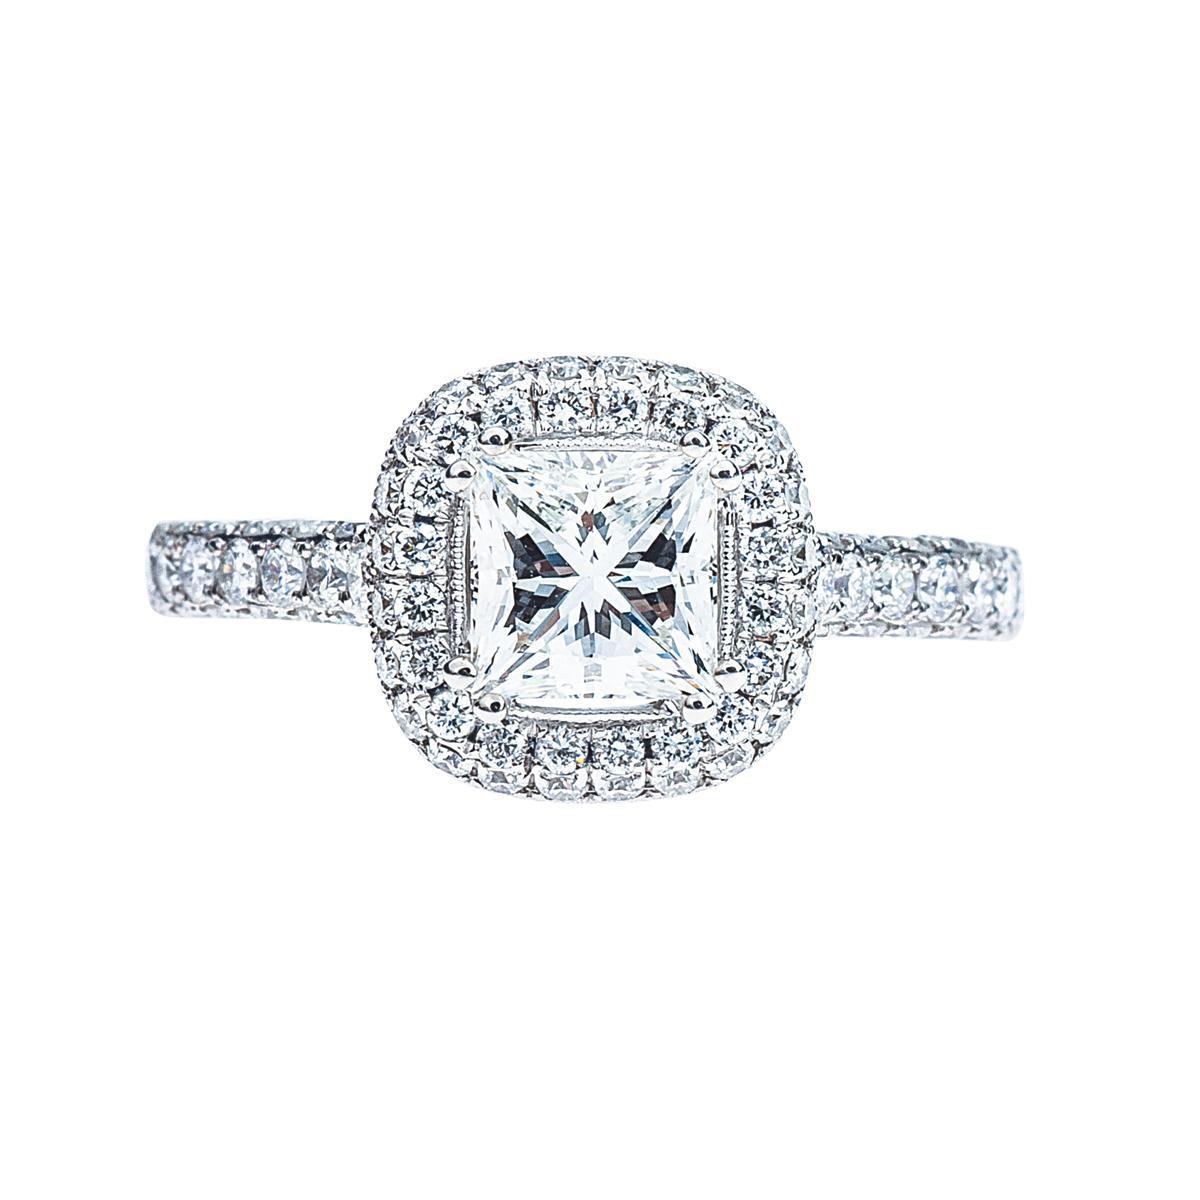 New 1.01 CT Princess Cut Engagement Ring